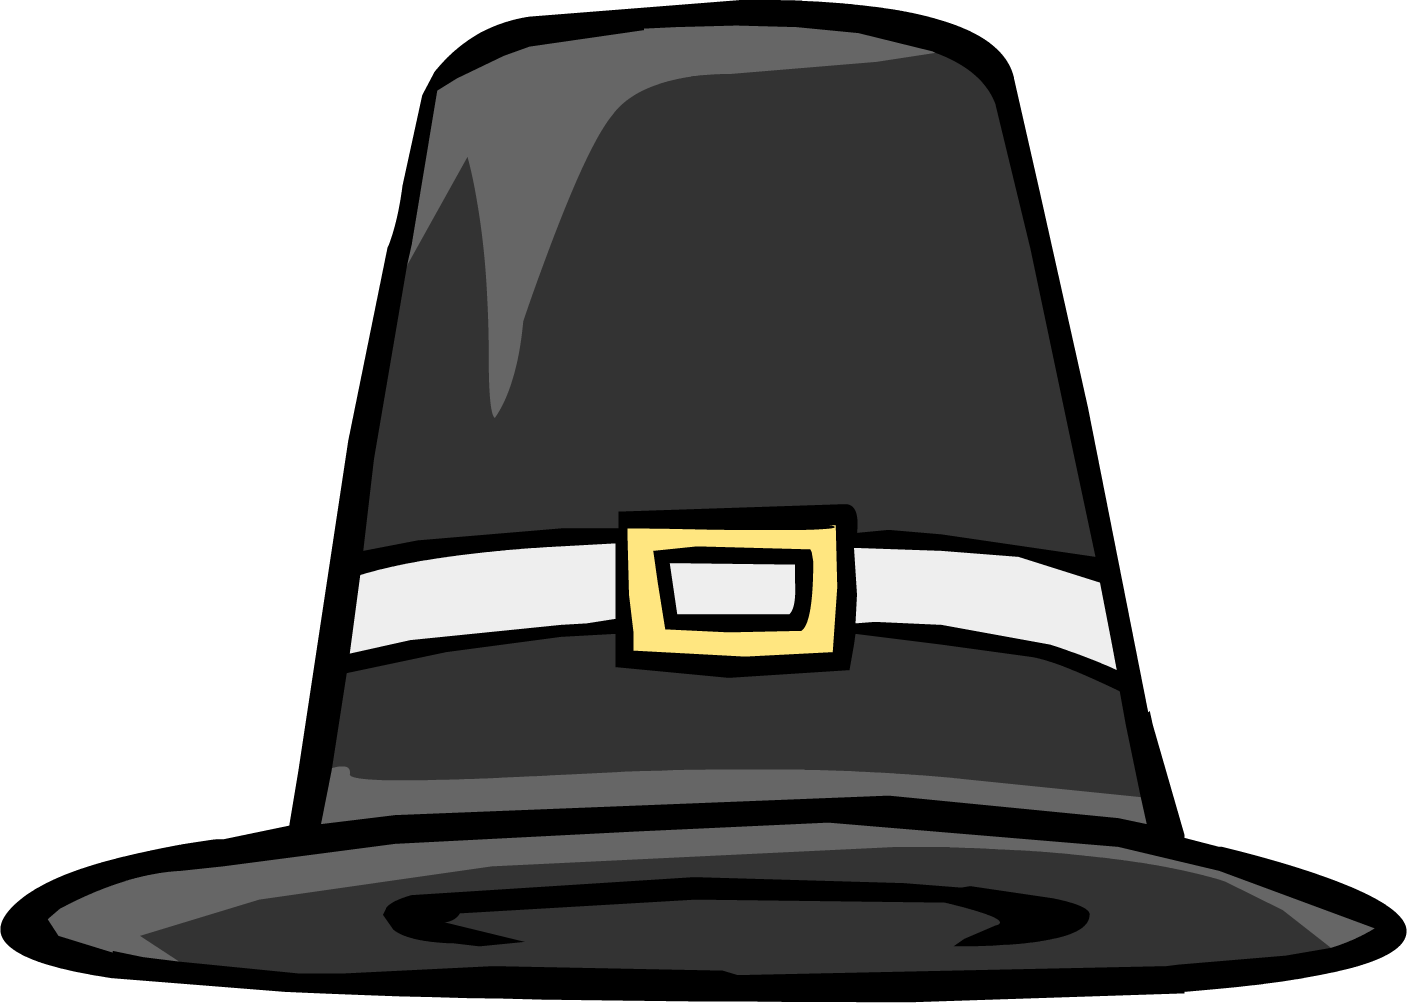 pilgrim hat club penguin wiki fandom powered by wikia rh clubpenguin wikia com pilgrim hat clipart black and white pilgrim bonnet clipart